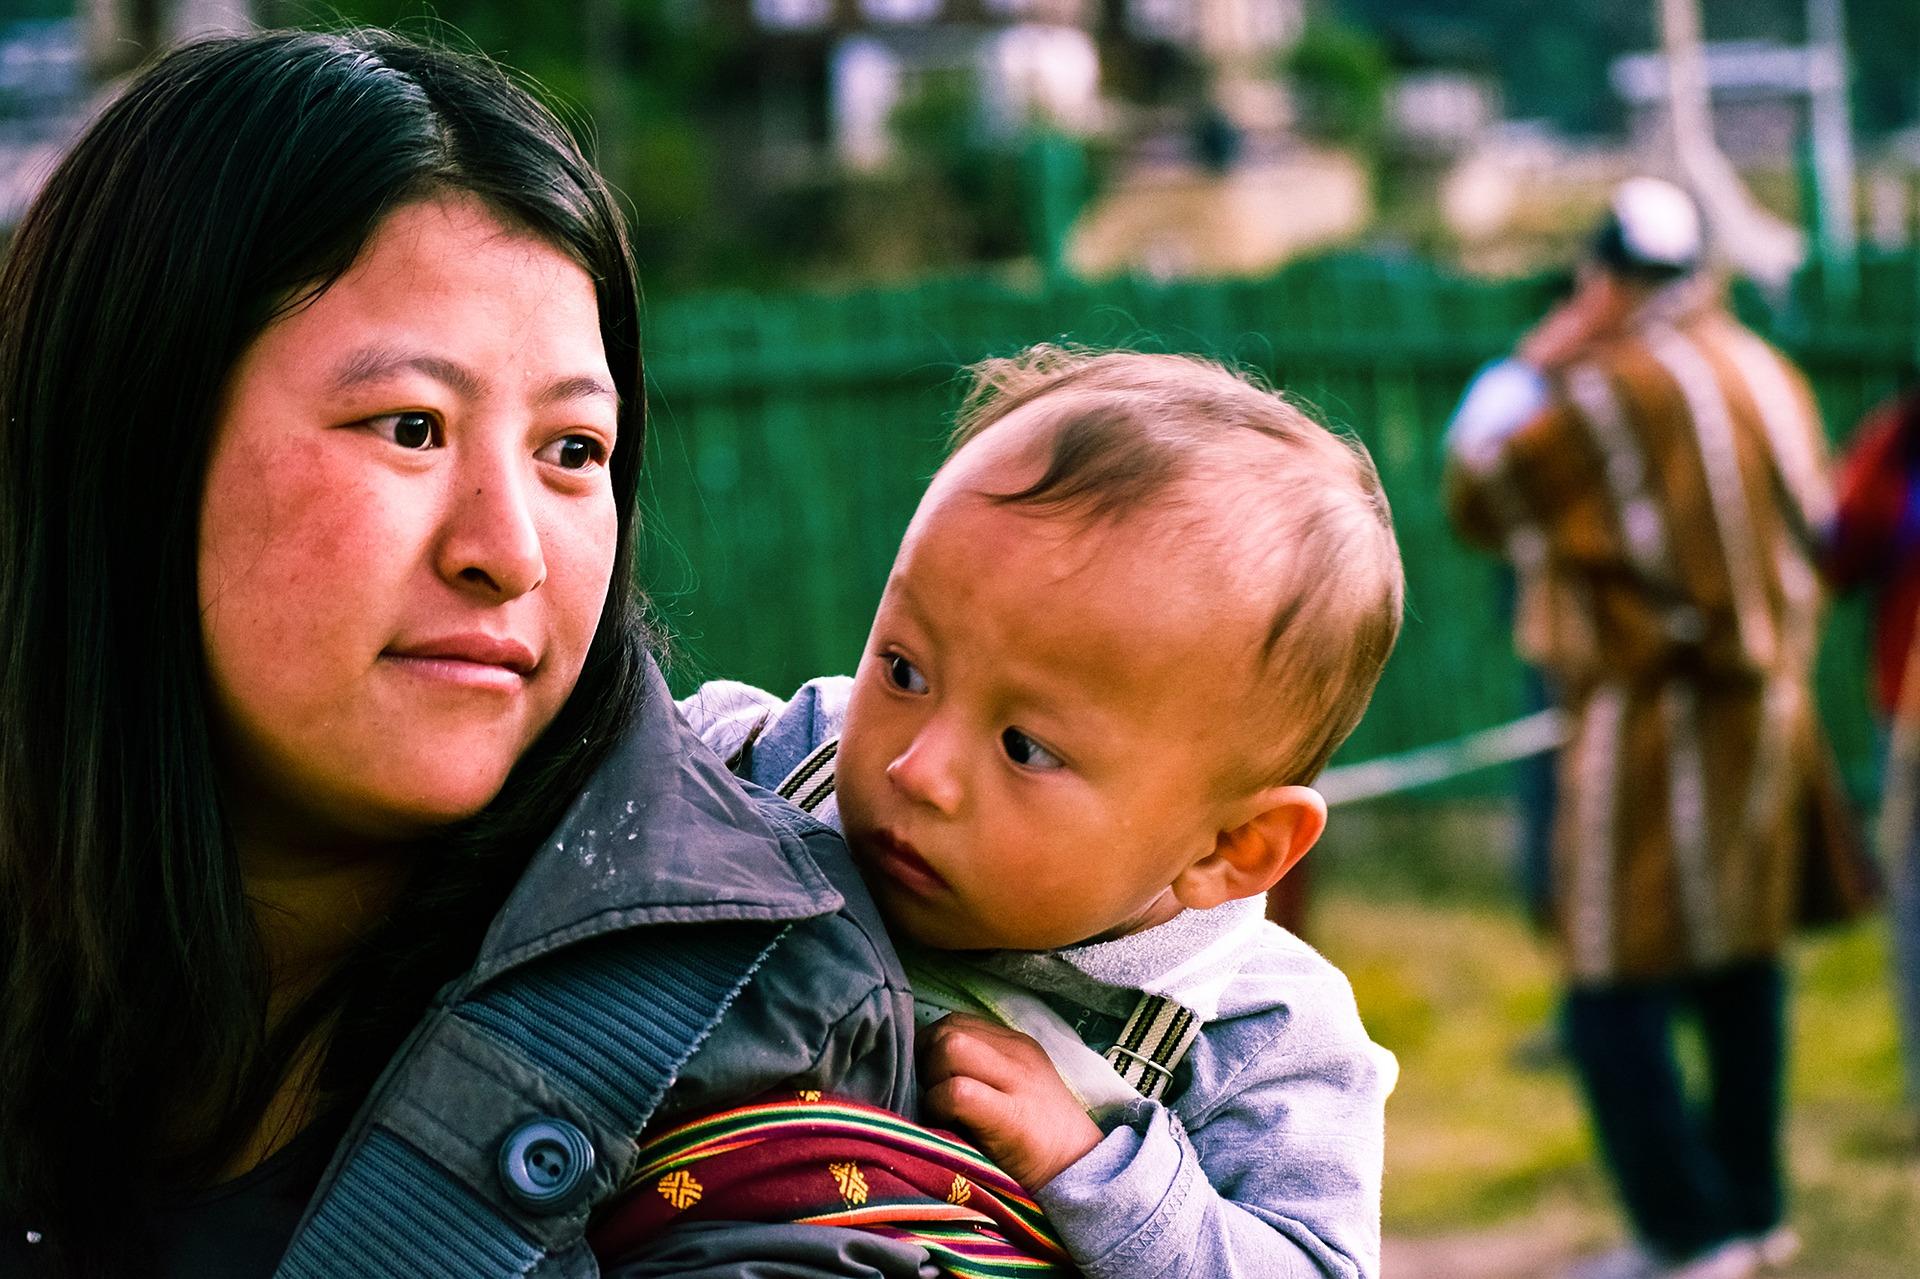 bhutanese-woman-with-kid-2725144_1920.jpg